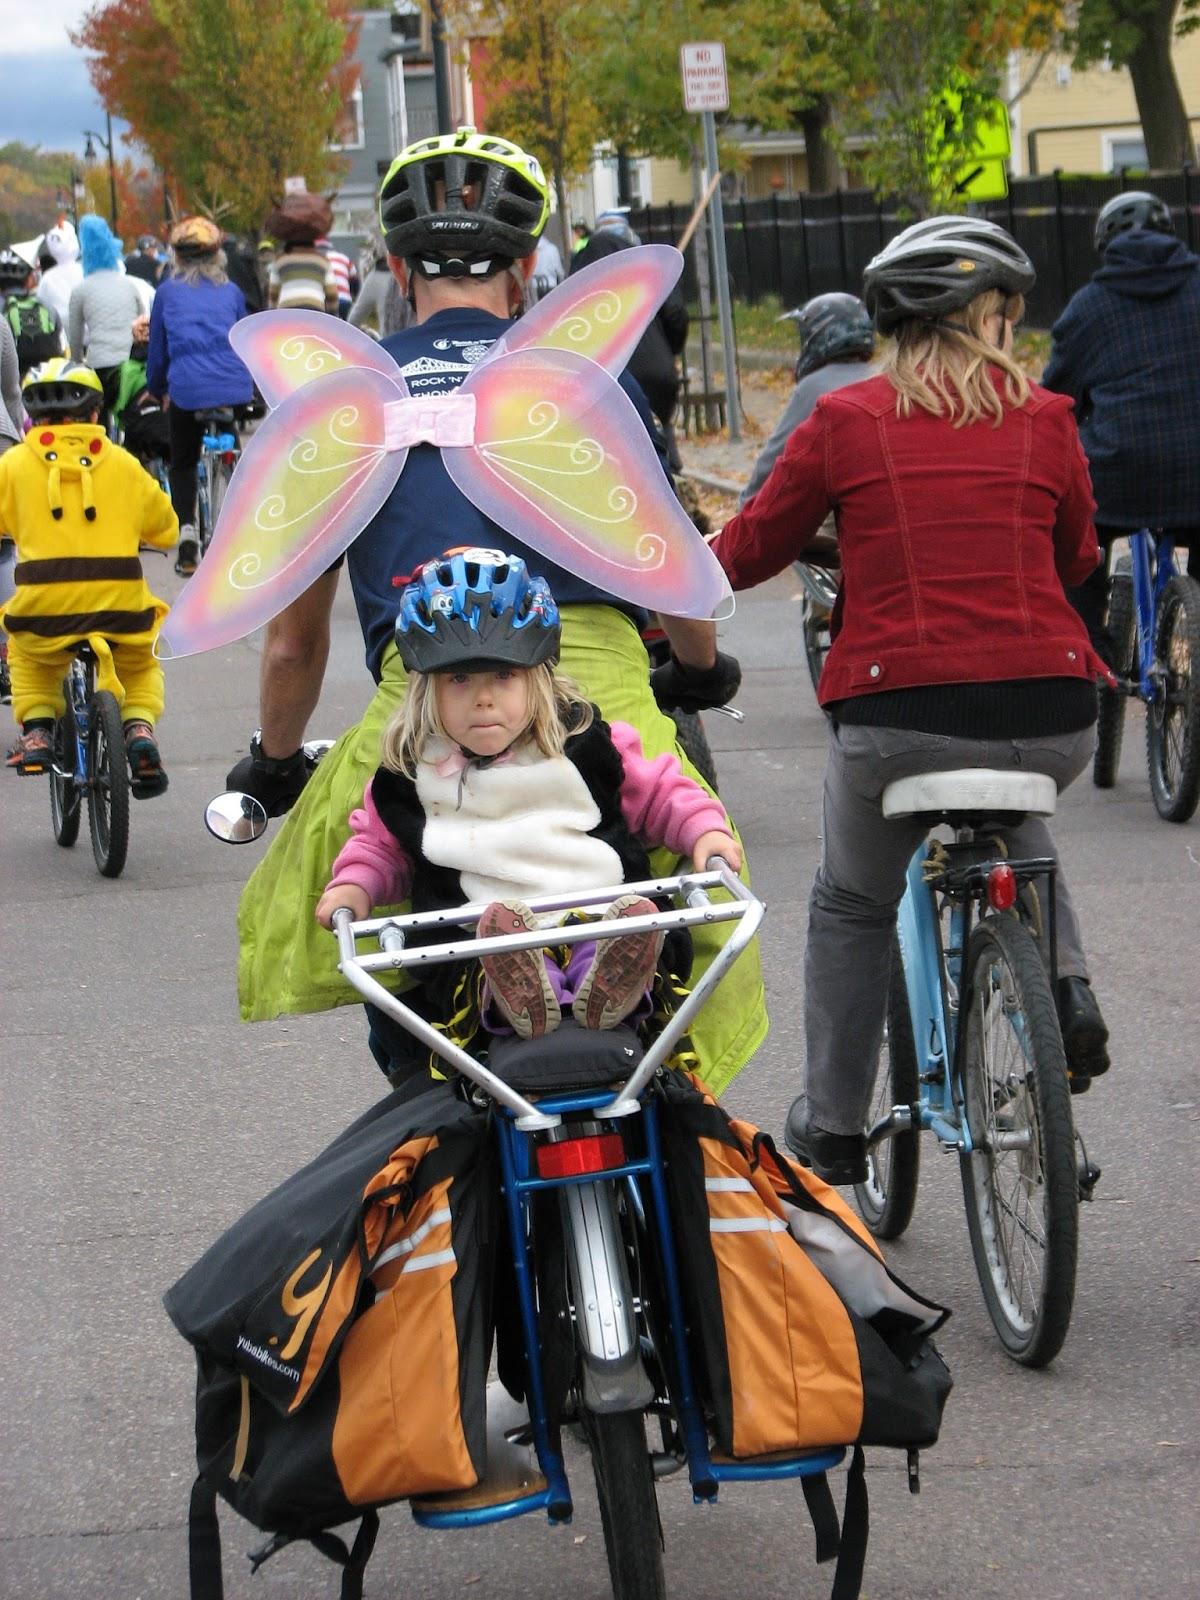 Photos: Portland bikes bare for 2018 World Naked Bike Ride